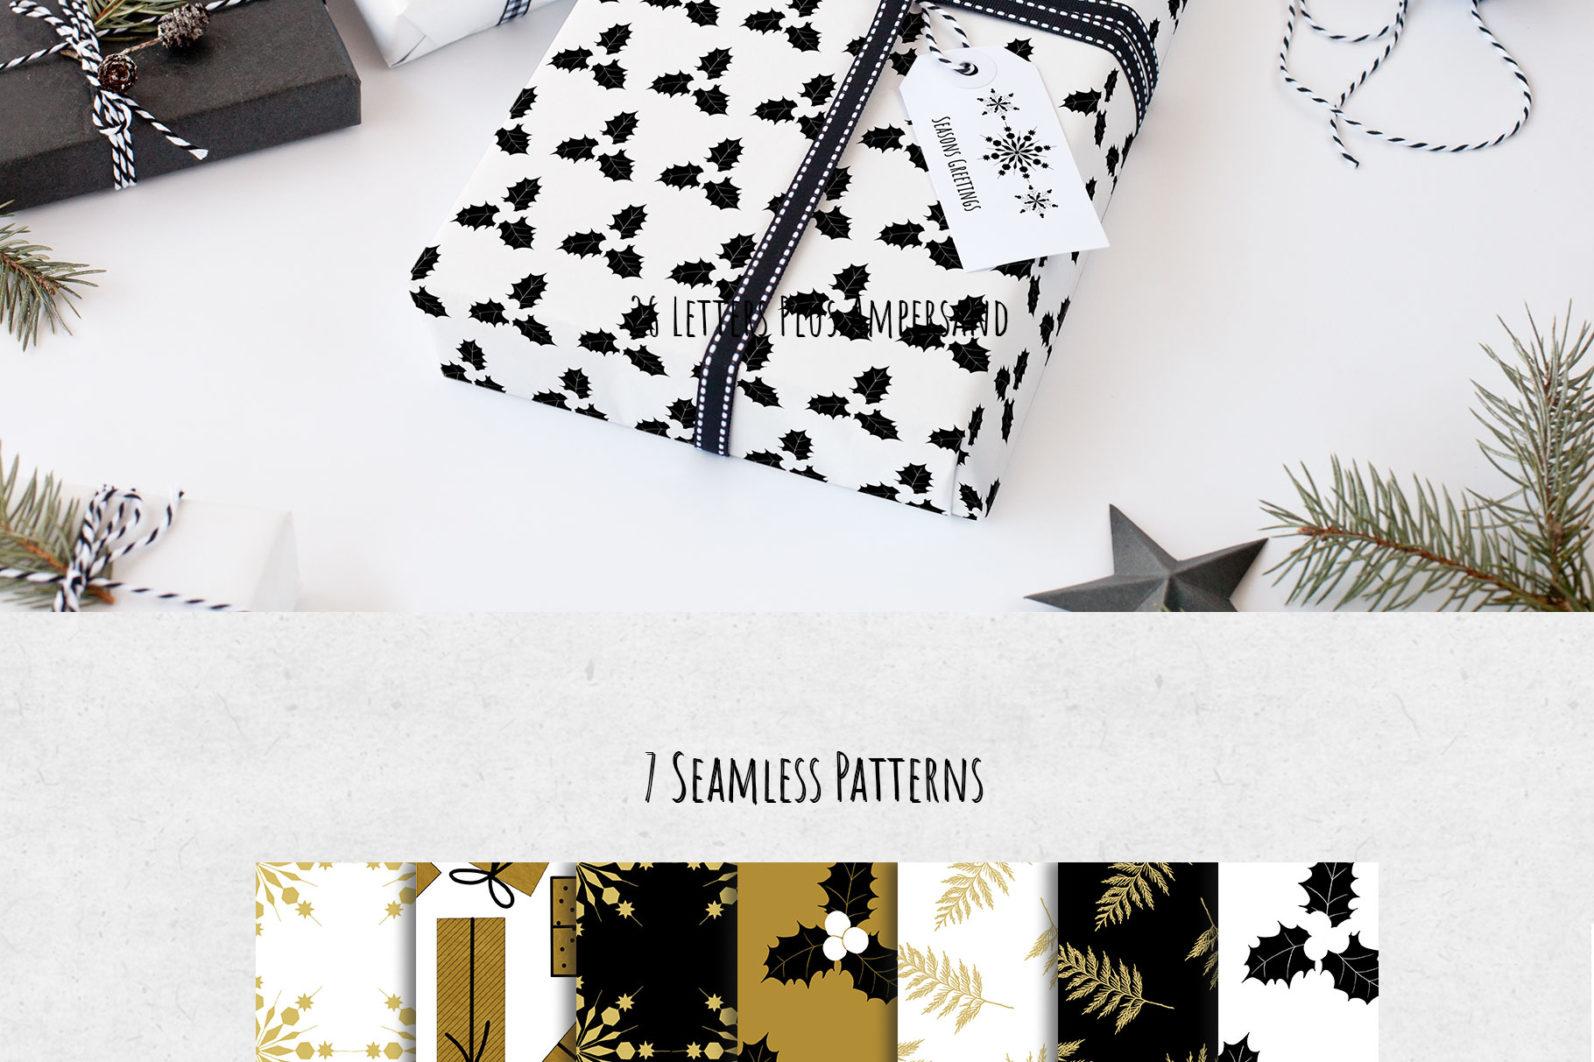 Black & Gold Christmas - chirstmas black gold patterns page -